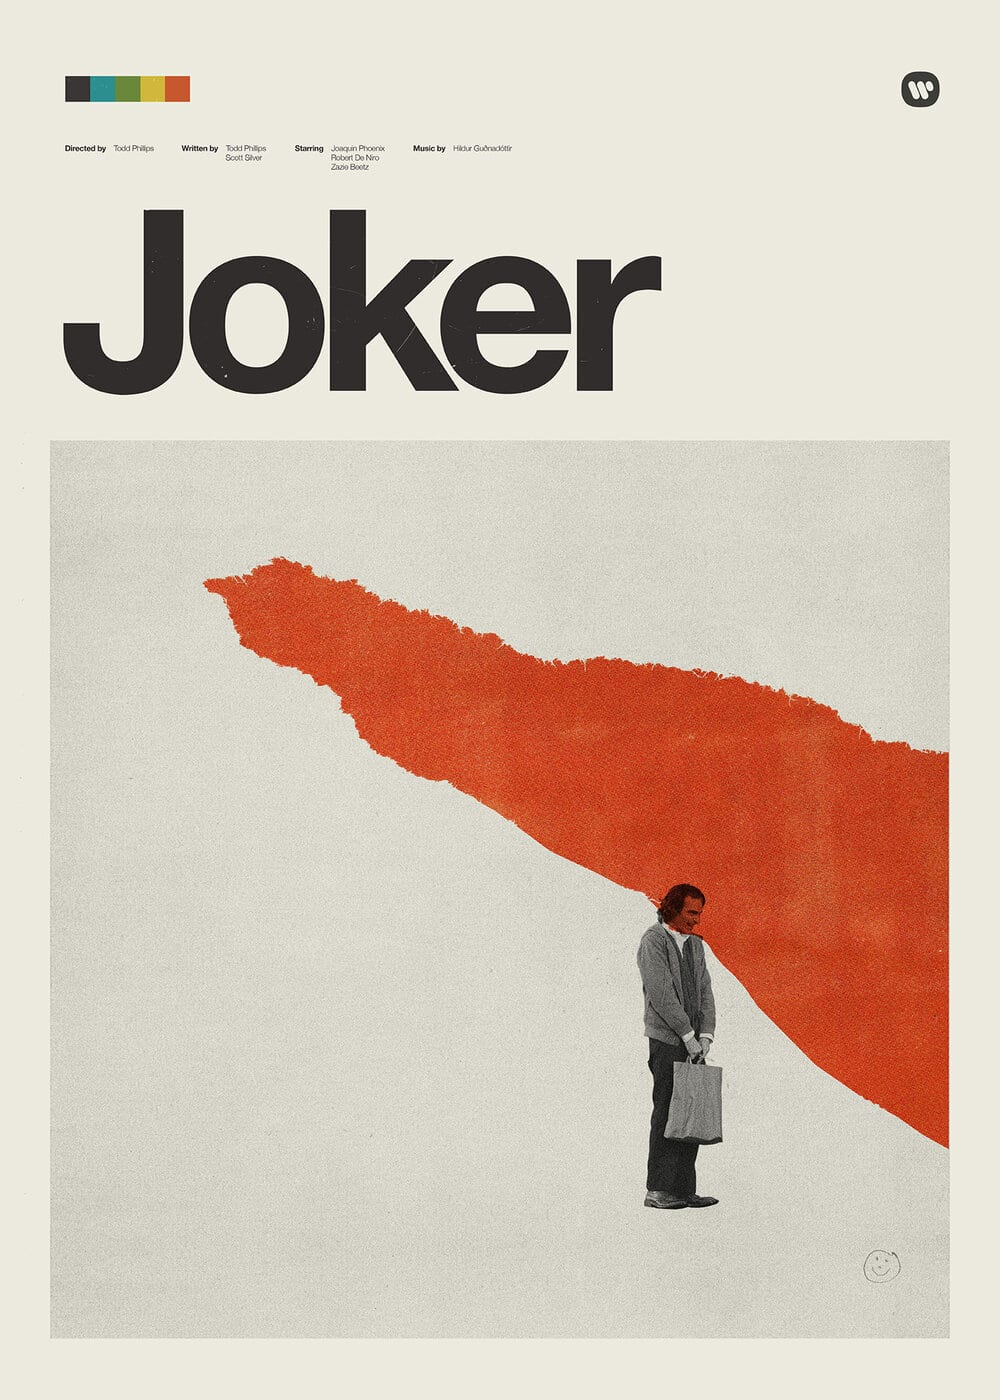 The Joker Retro Modern Movie Poster designed by Patrick Concepcion